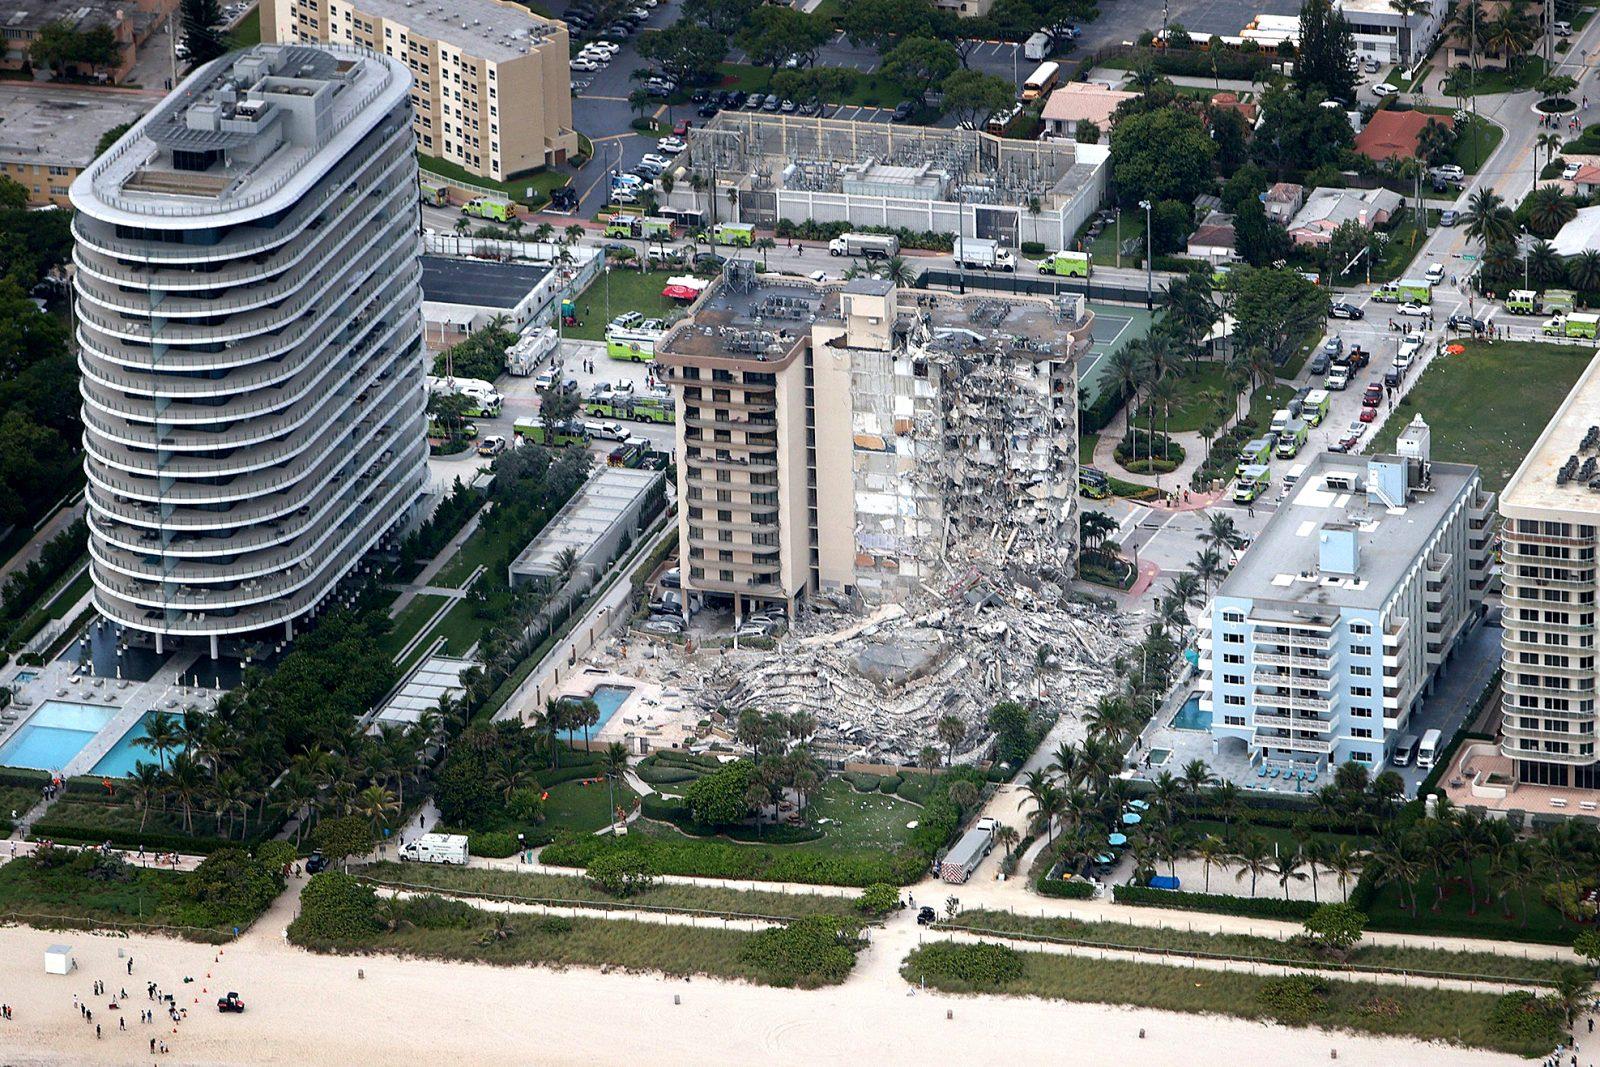 4 dead, 11 hurt, dozens missing in high-rise collapse near Miami Beach